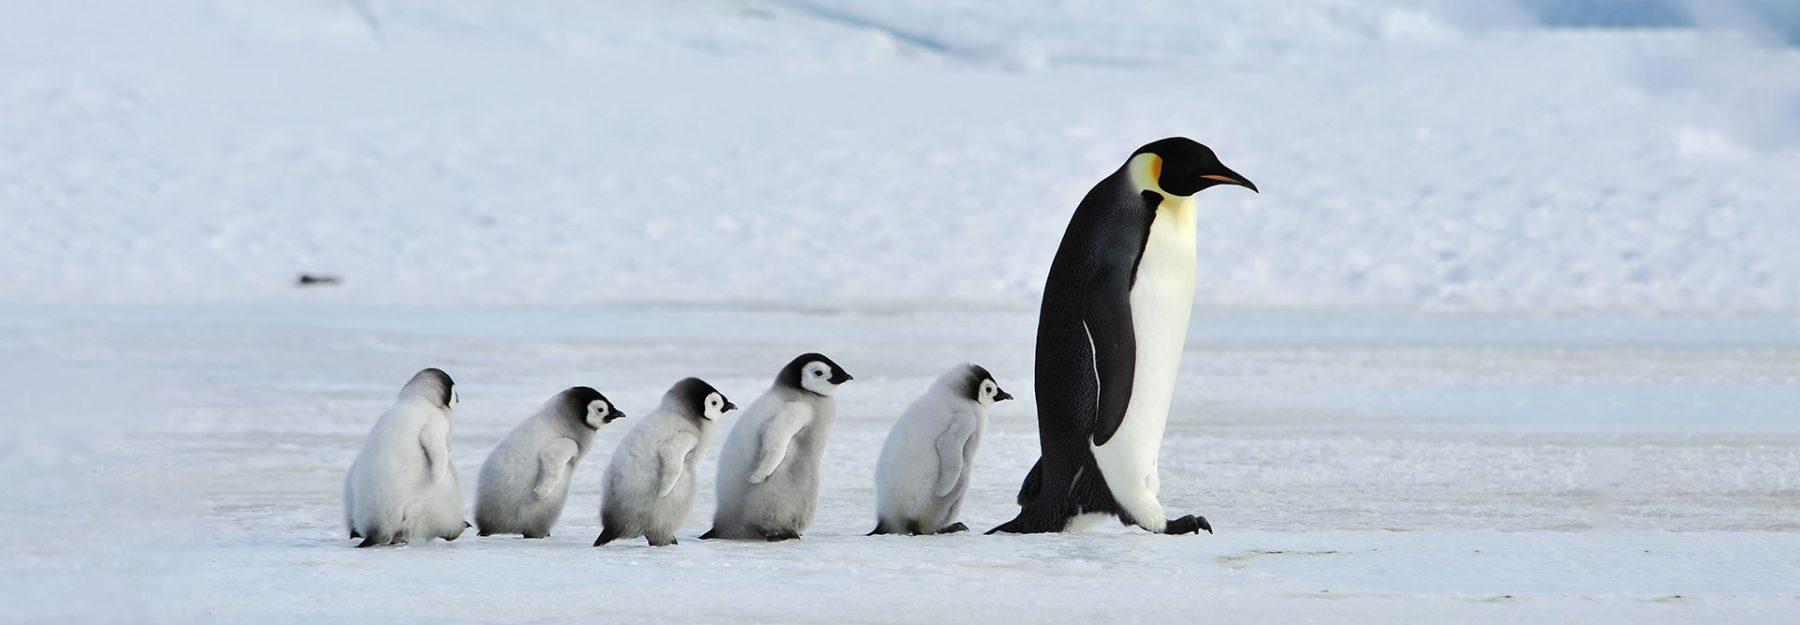 Viaggio in Antartide Pinguini Imperatore